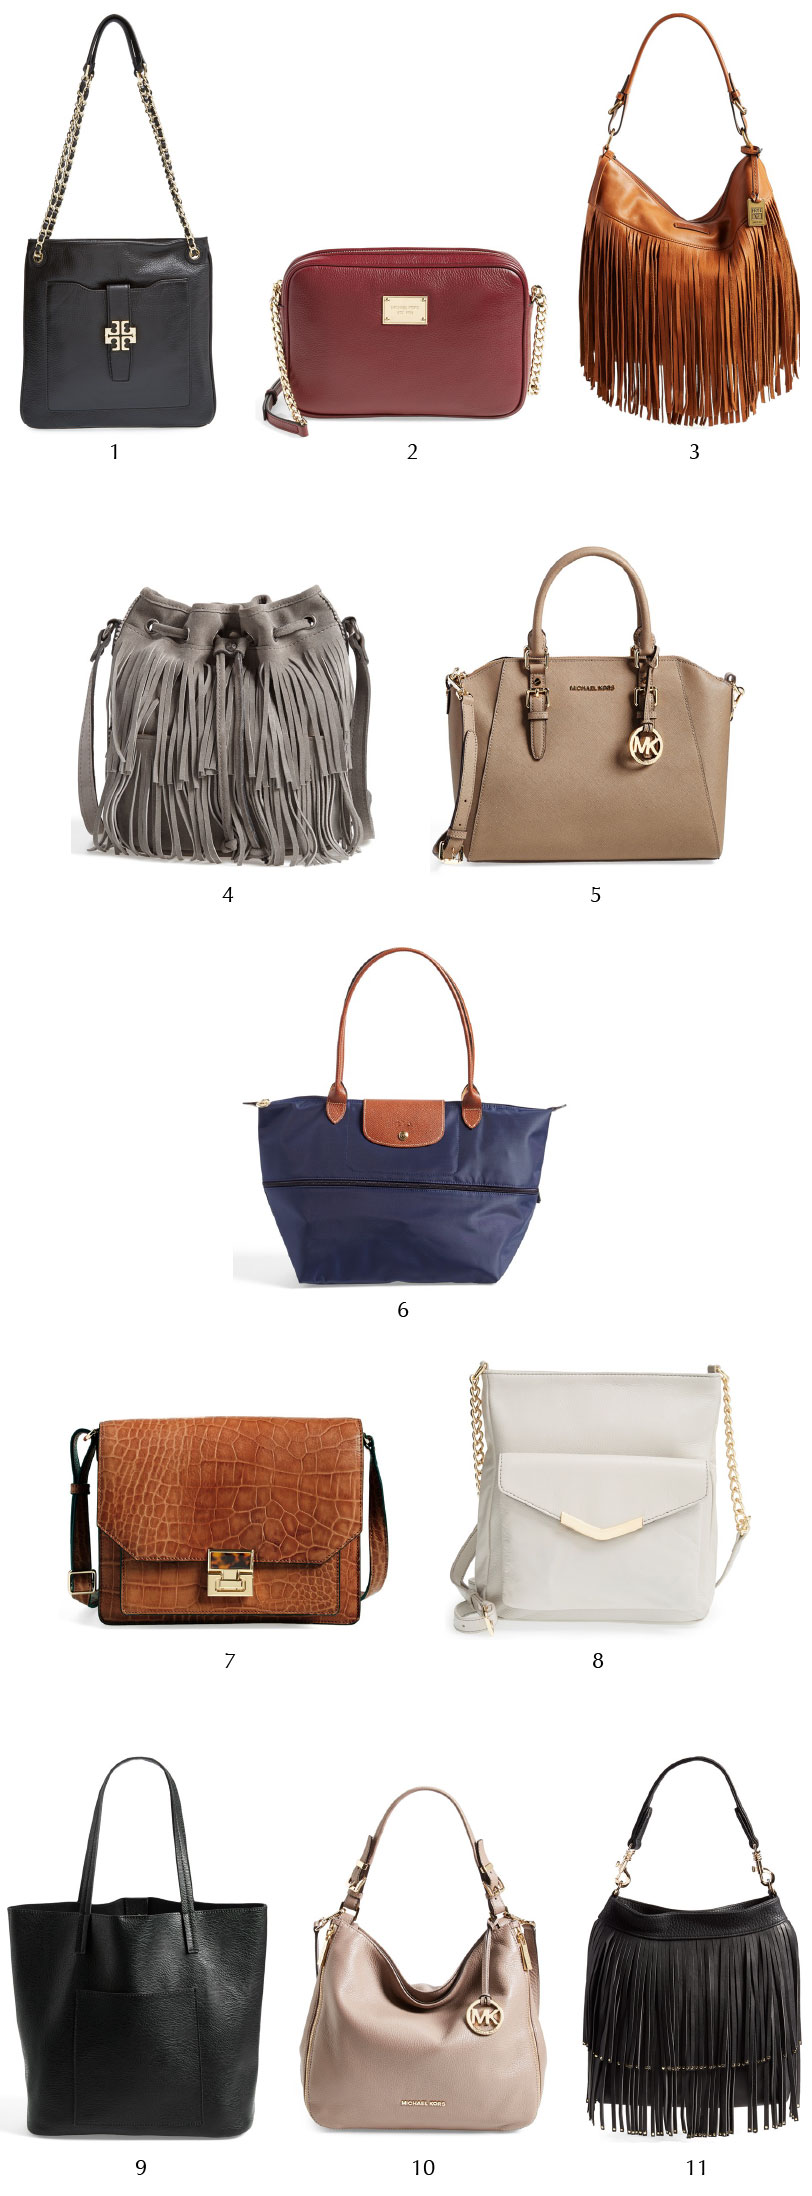 2015-nordstrom, Nordstrom, anniversary-sale, nordstrom-anniversary-sale, fashion-blogger